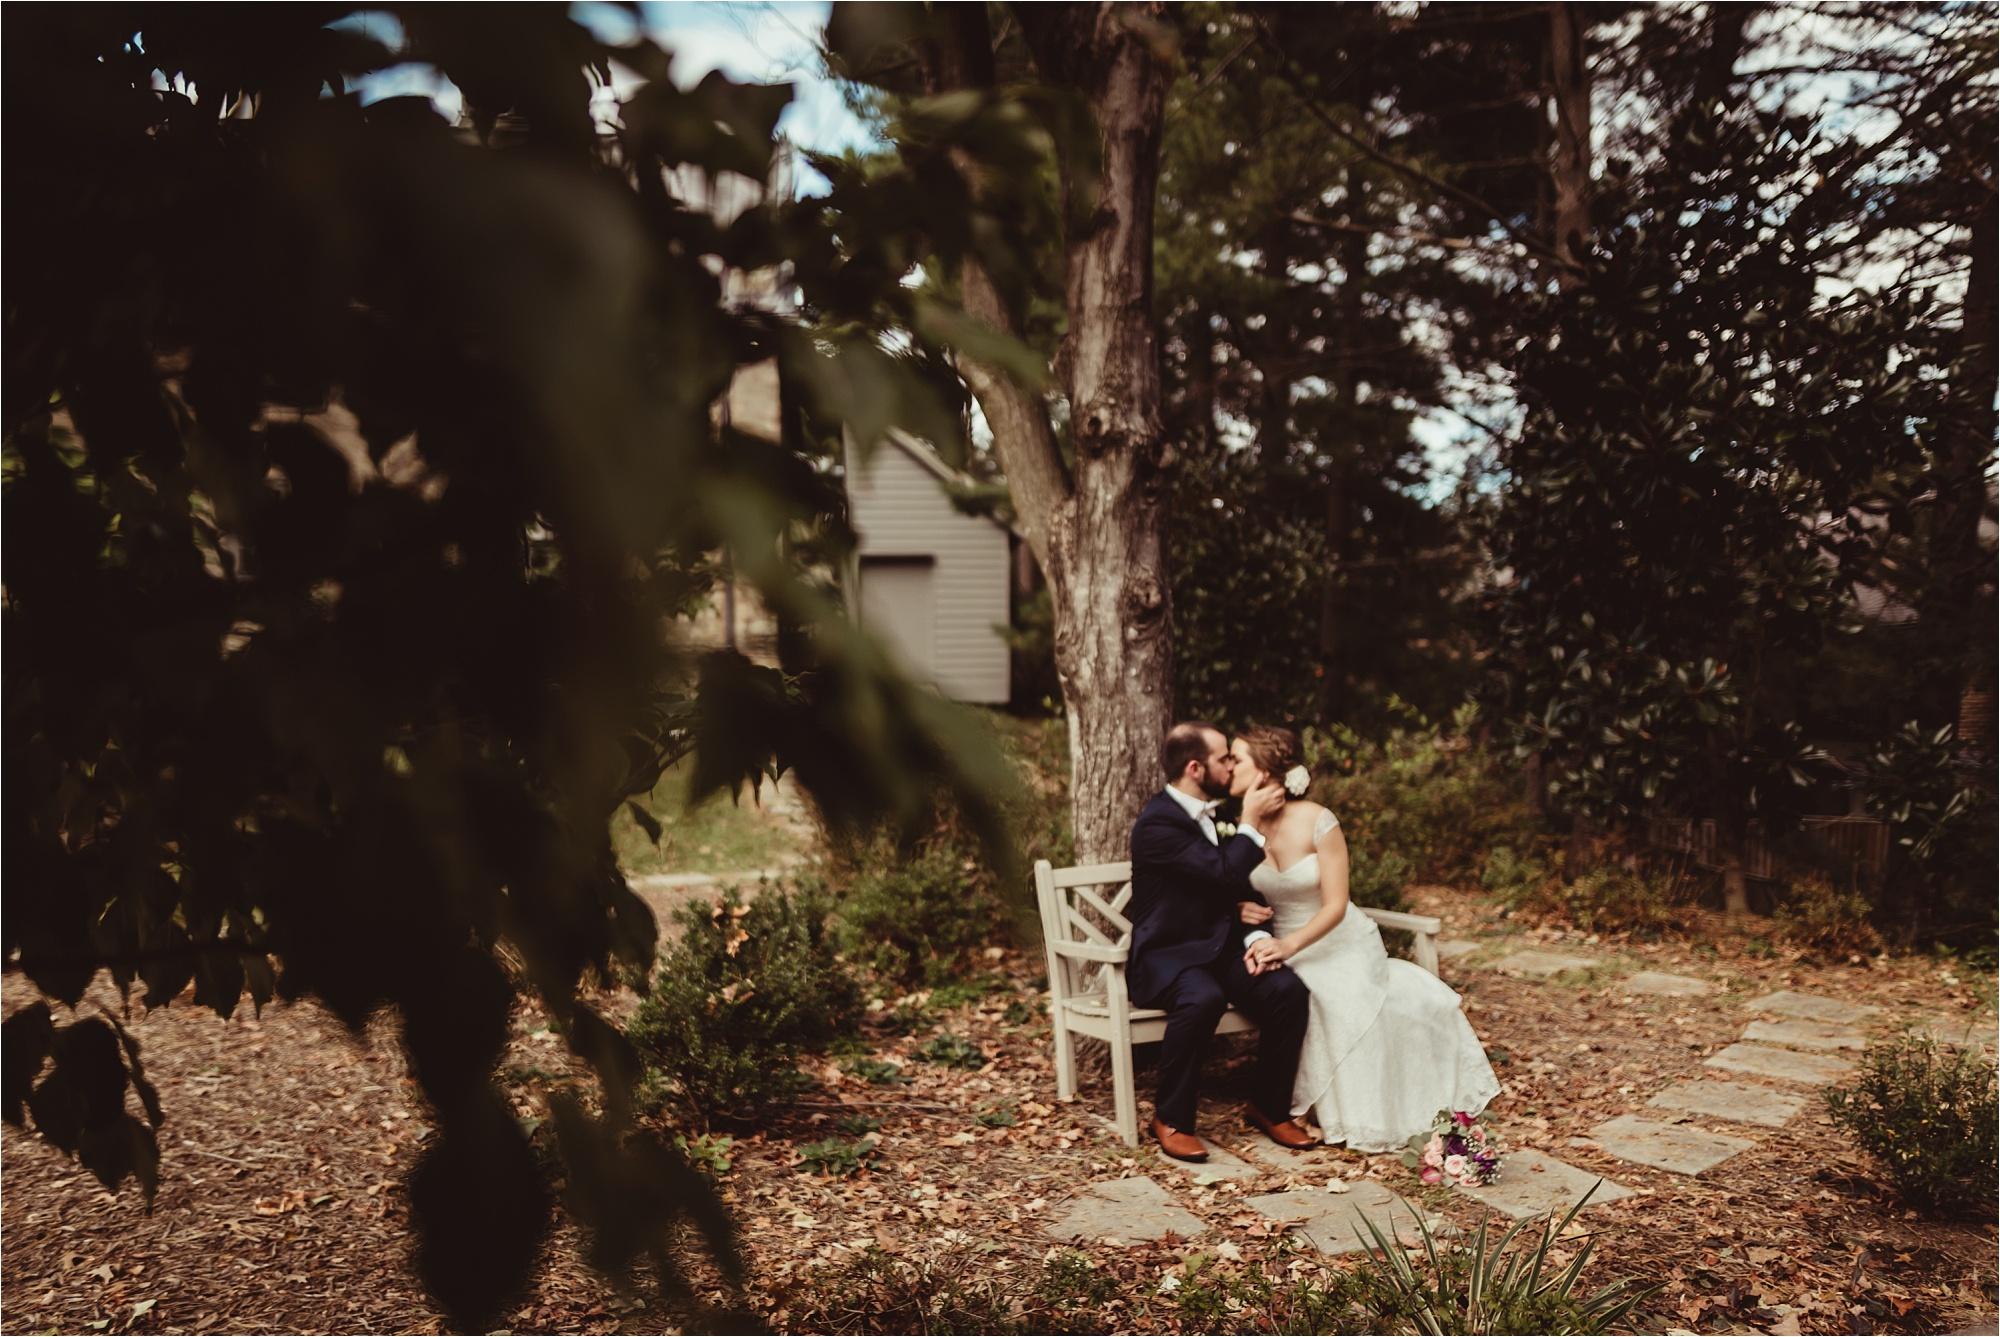 brittney-nestle-photo-tyler-and-kelsey-oliver-carriage-house-wedding.jpg